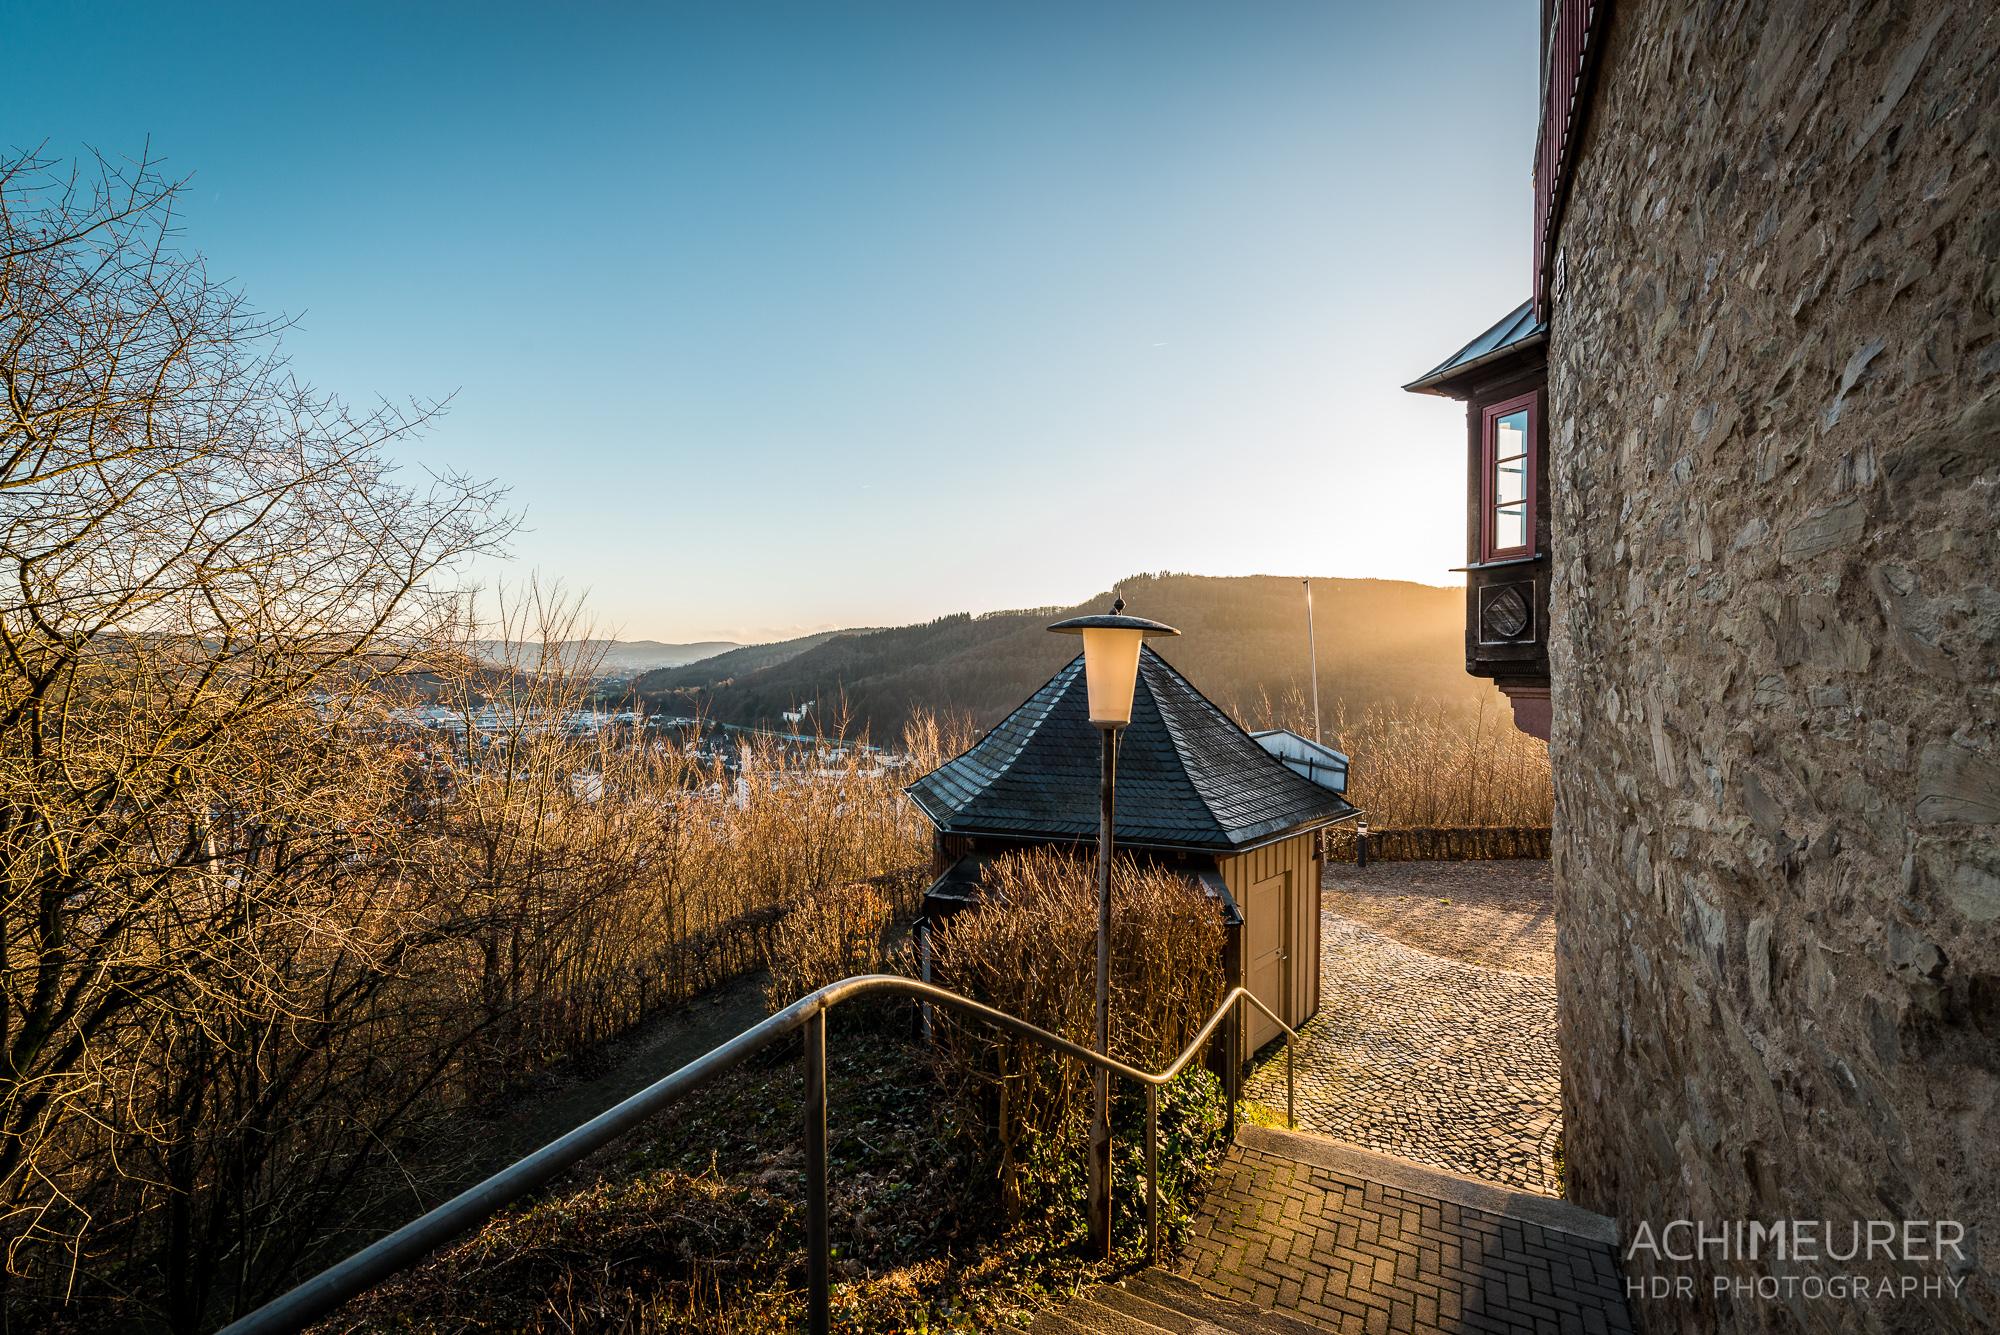 Spaziergang am Schlossberg in Biedenkopf